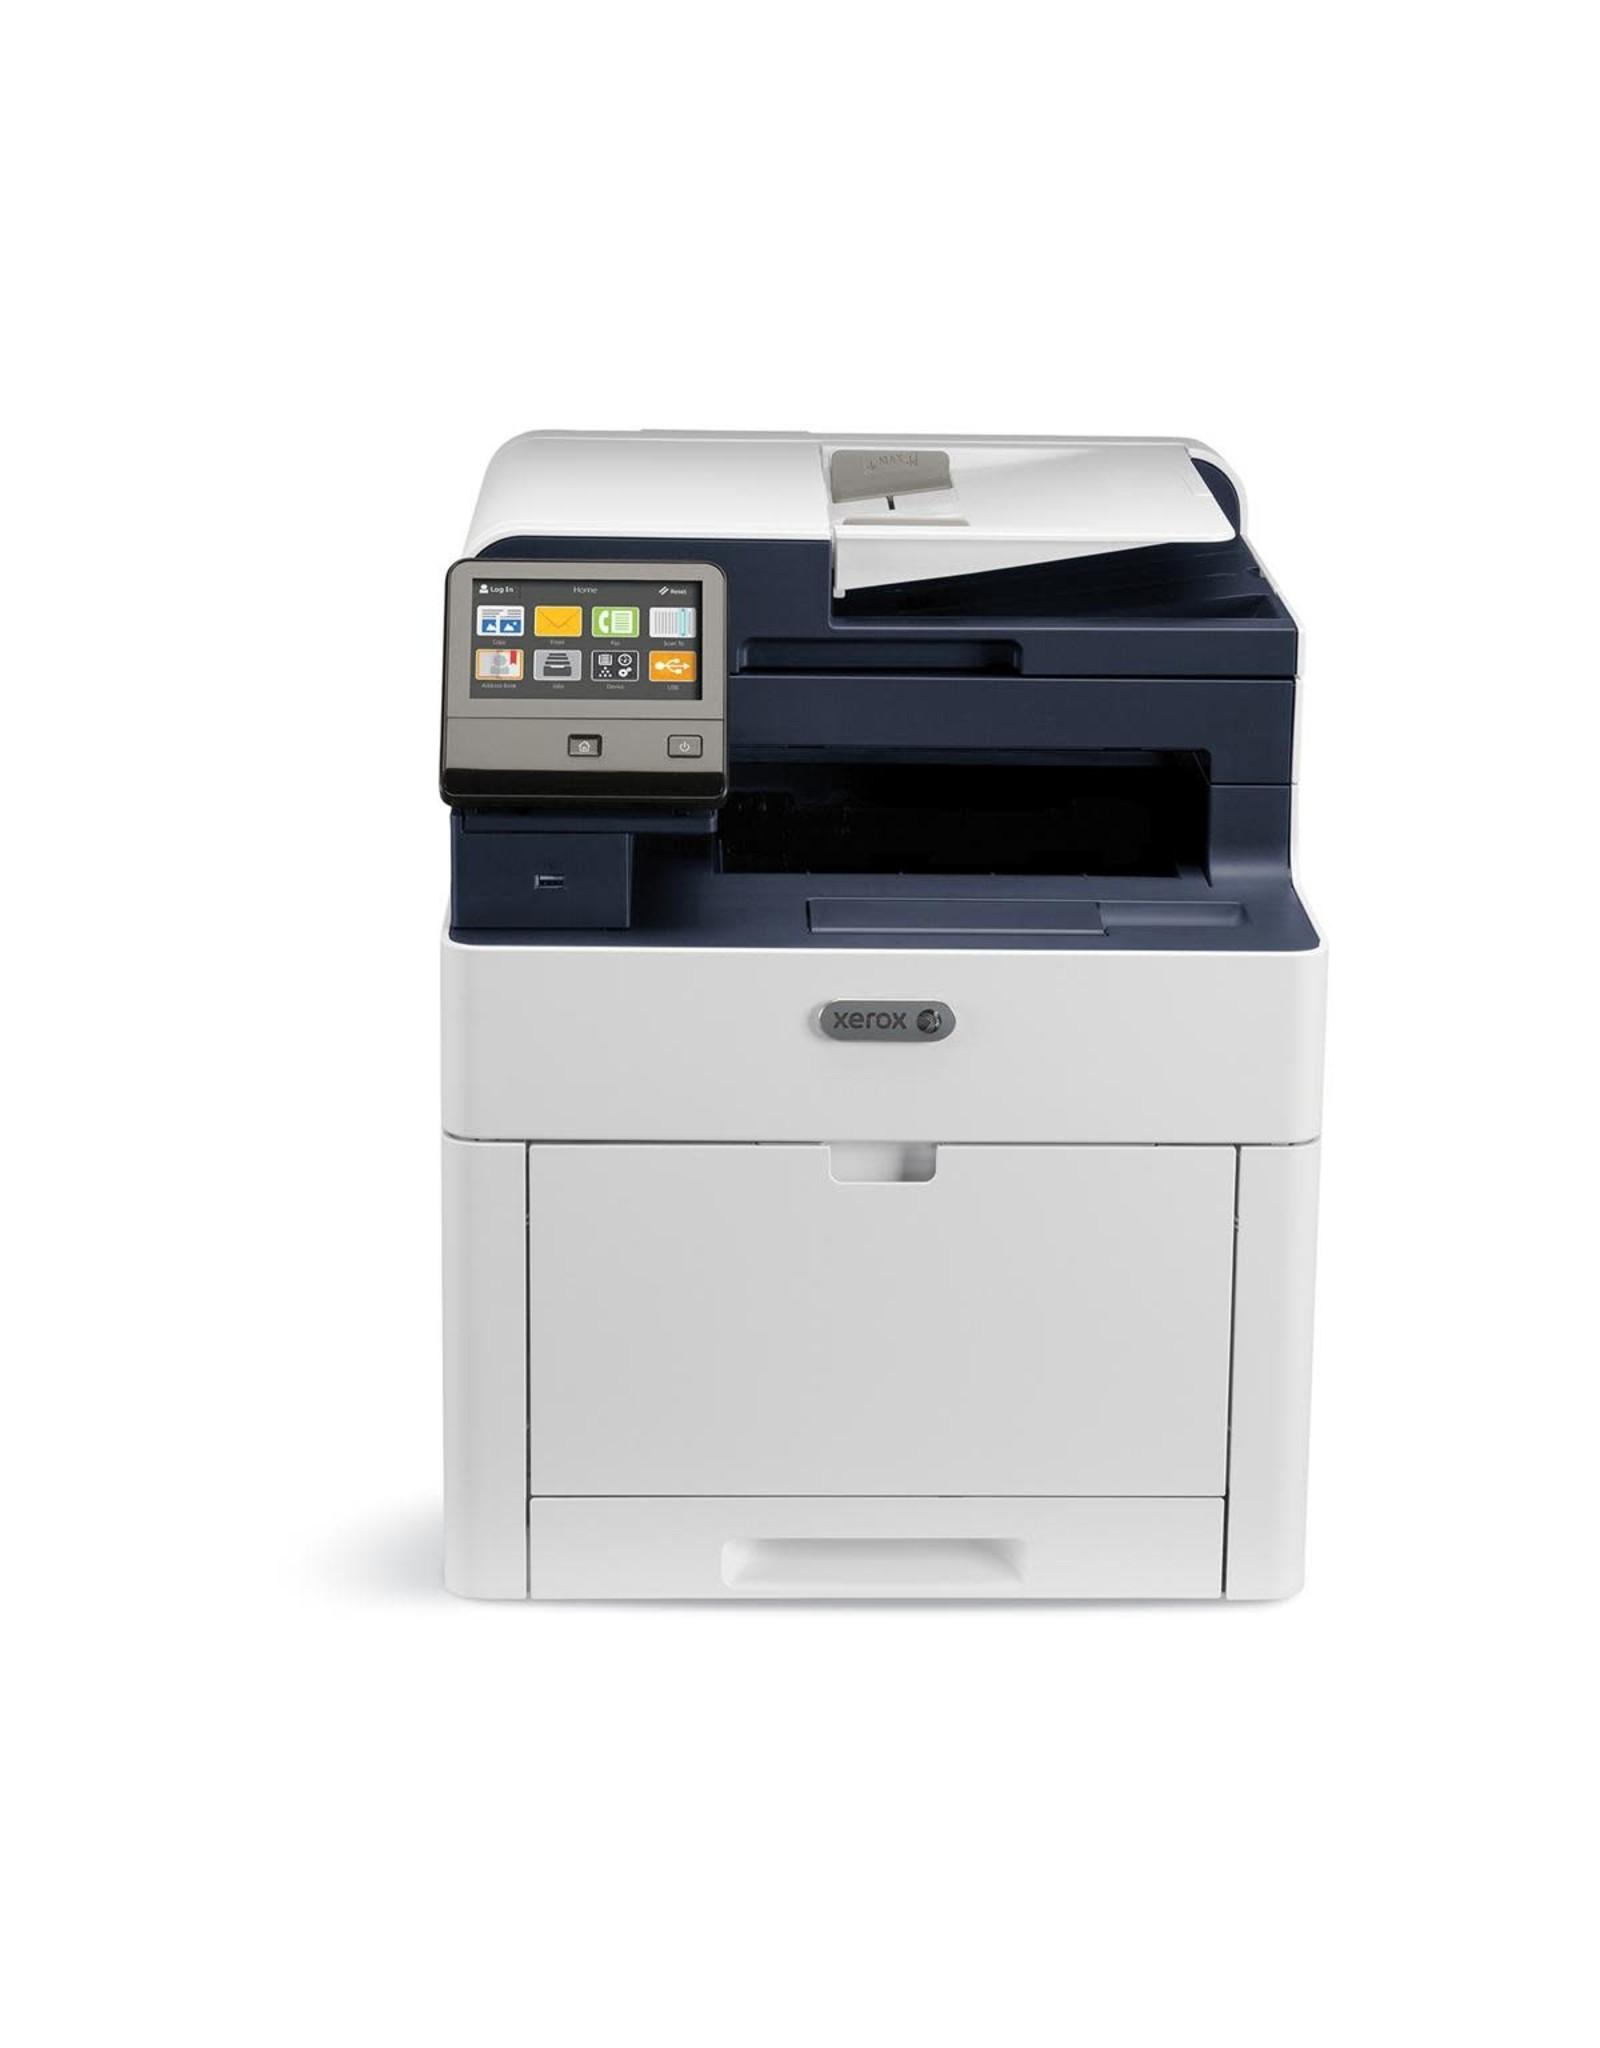 Xerox Xerox WorkCentre 6515 Wireless Color All-in-One Printer